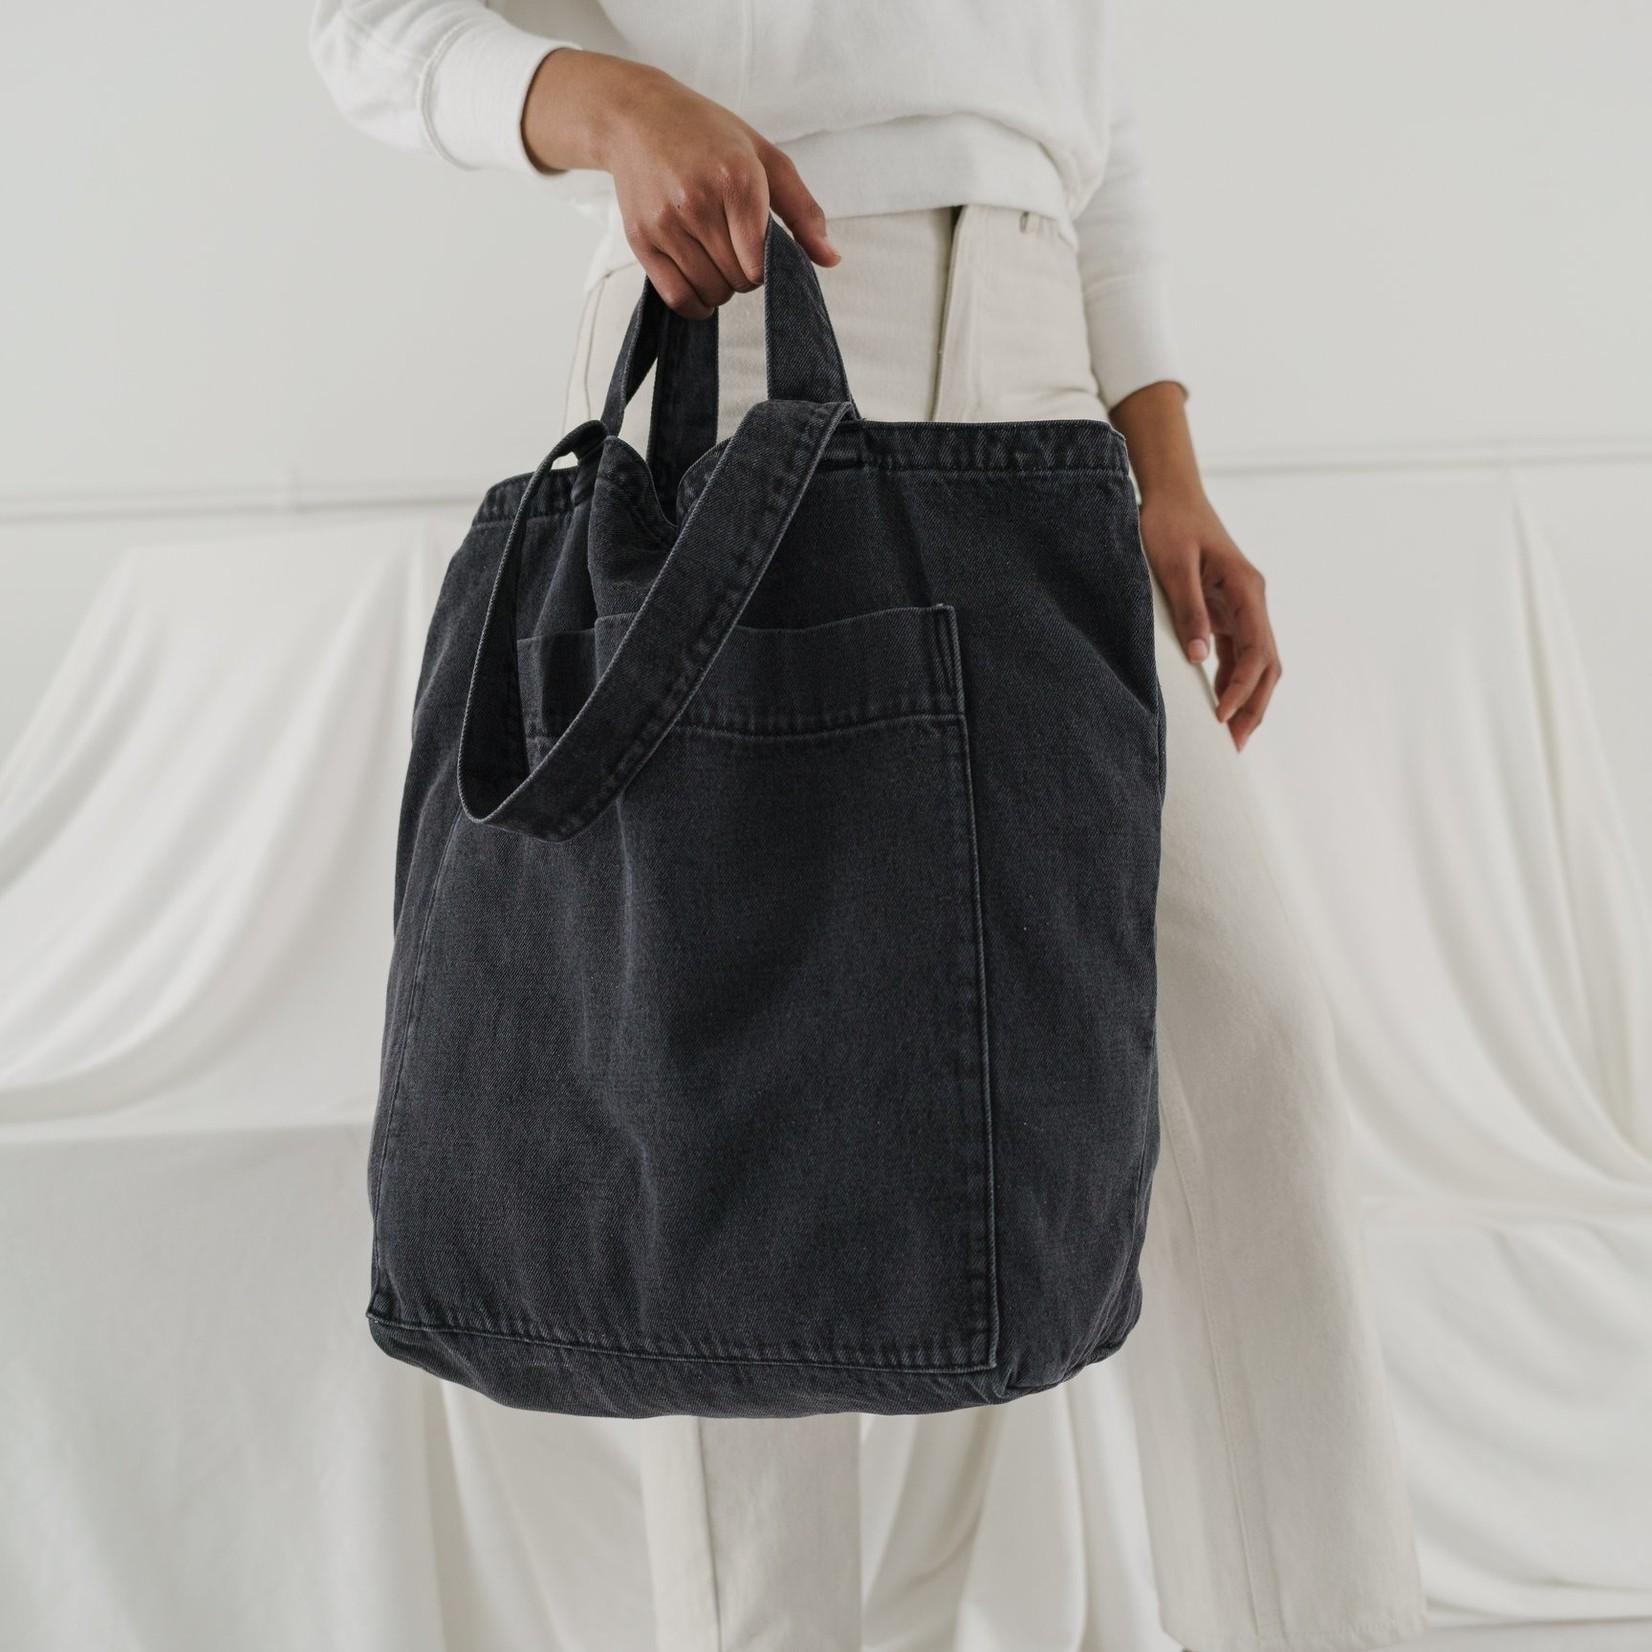 Baggu Baggu Giant Pocket Tote Washed Black